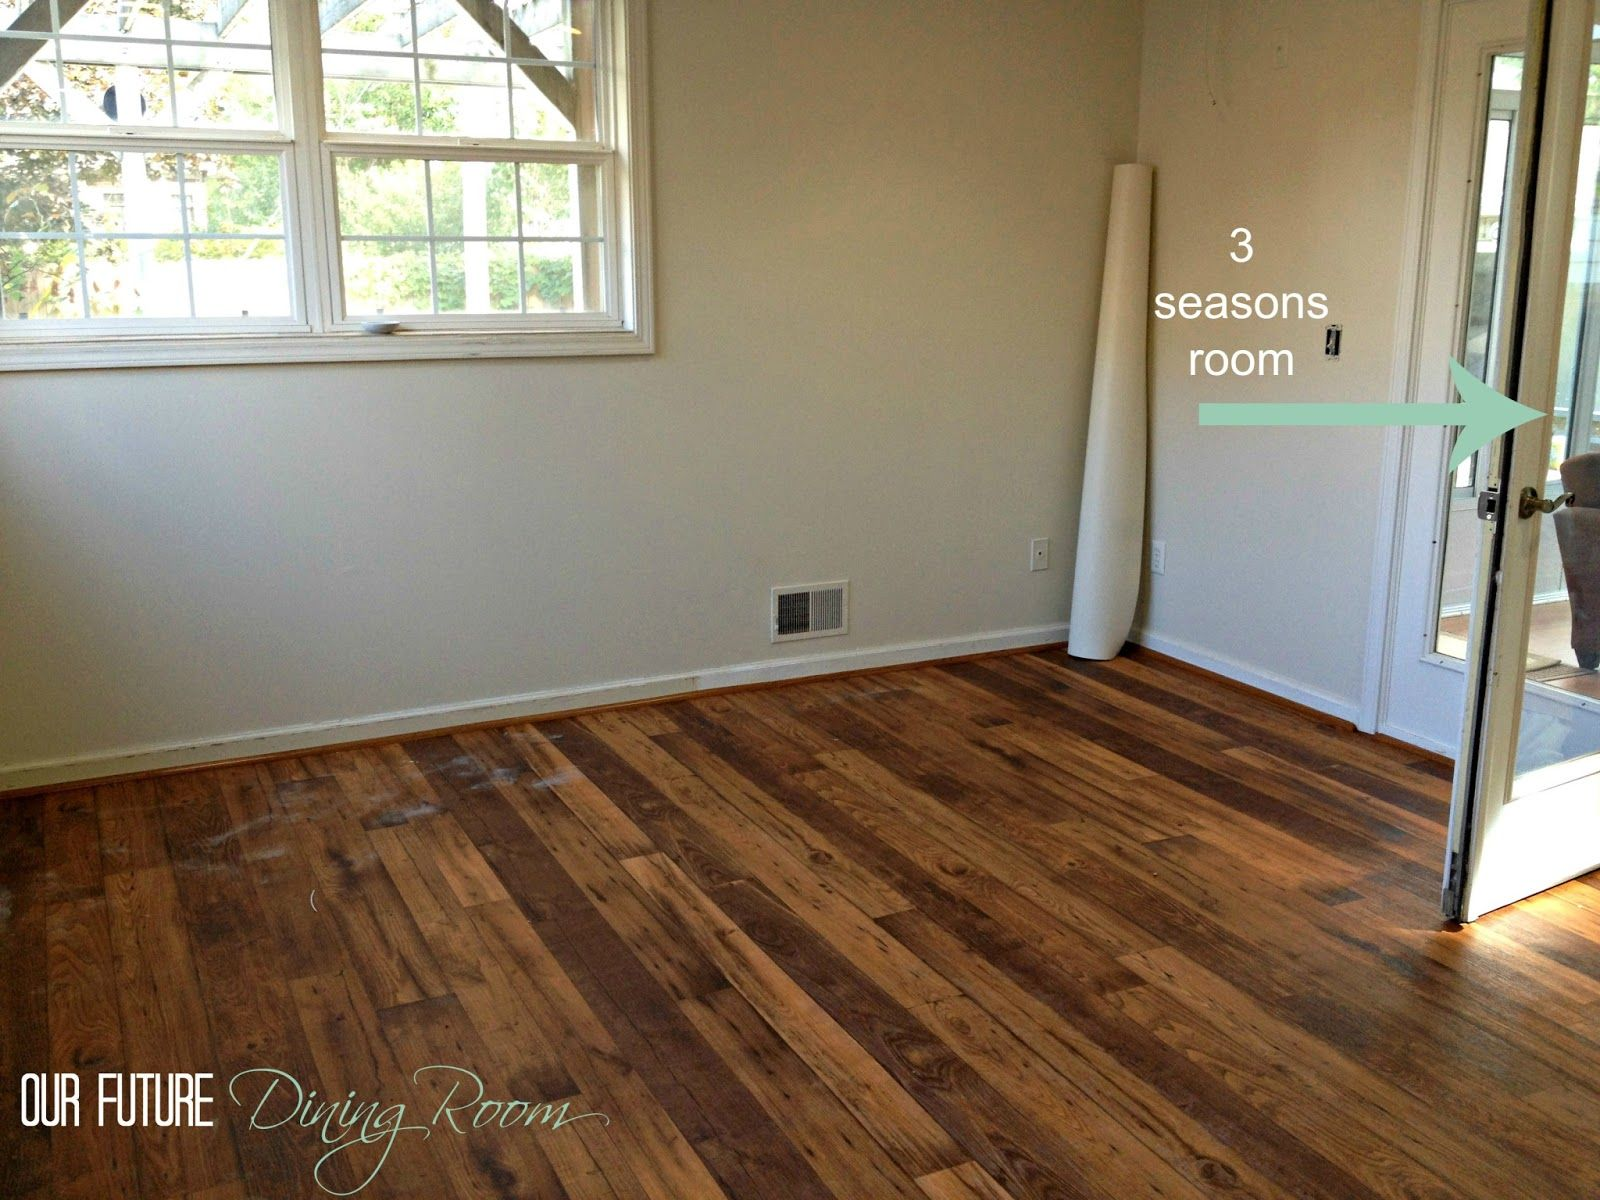 kitchen flooring wood floors in kitchen linoleum wood flooring faux hardwood we went with a textured vinyl flooring